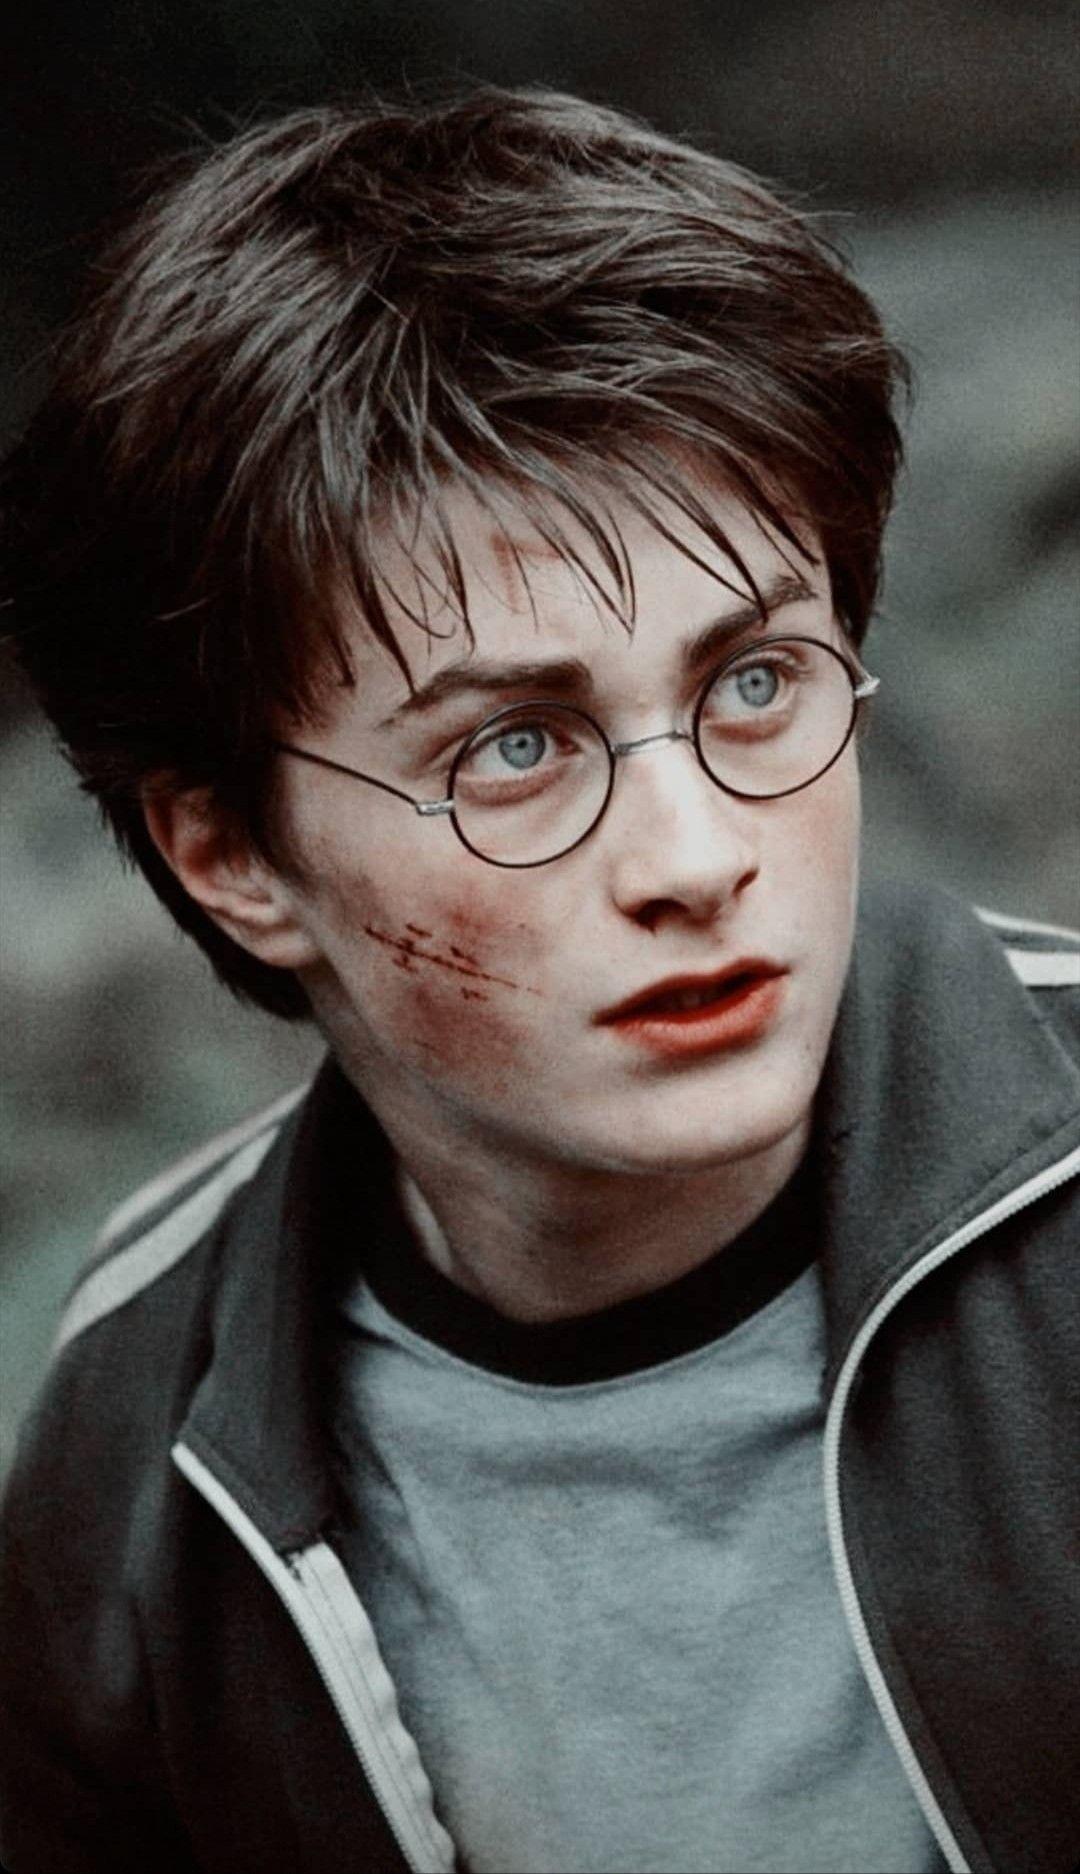 Harry James Potter Harry Potter 2 Harry Potter Tumblr Harry James Potter